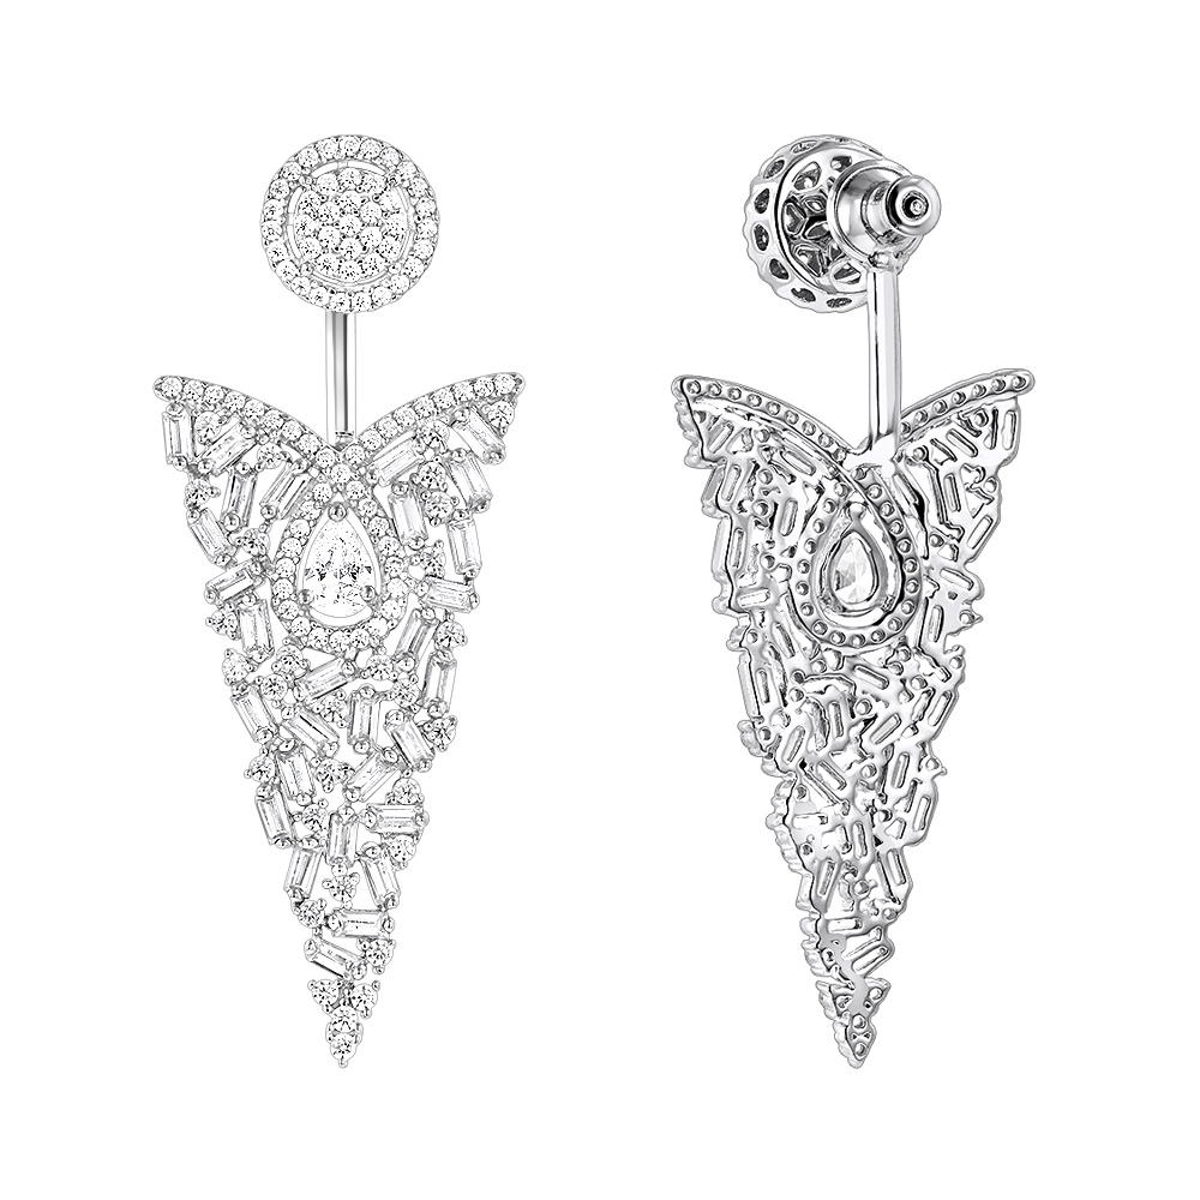 Unique 14K Gold Designer Baguette Round Diamond Earrings 4ct